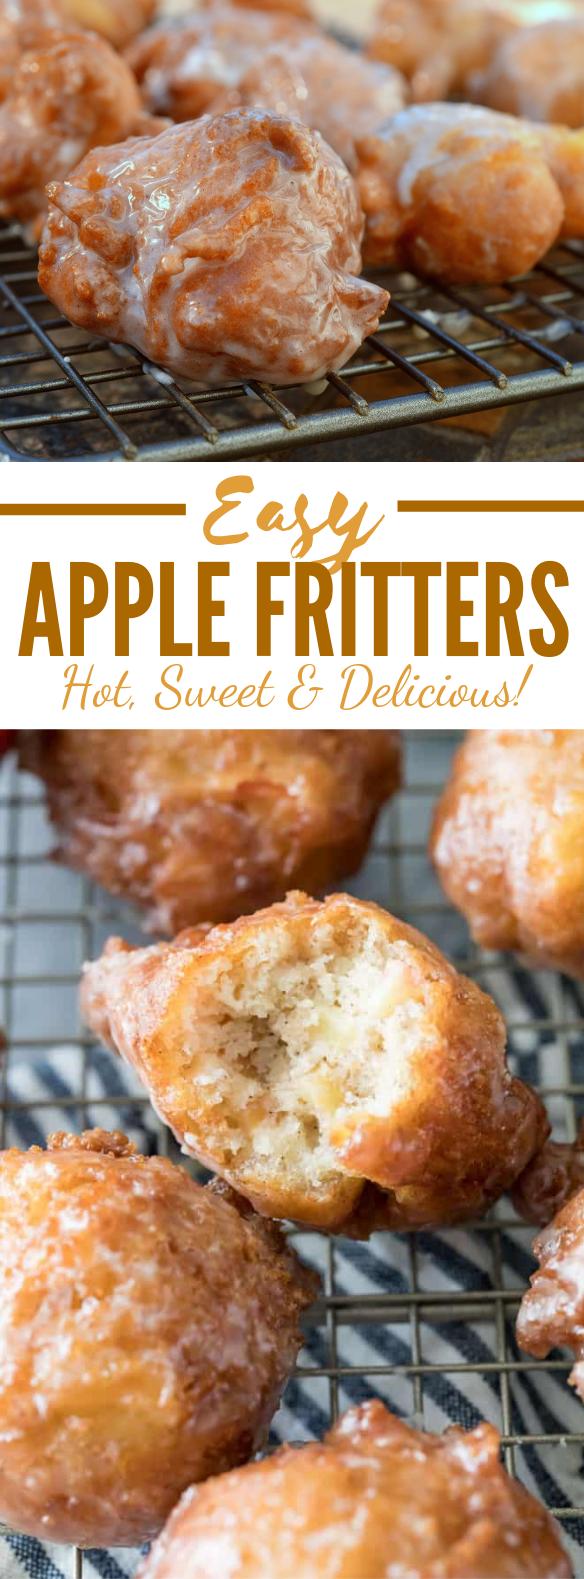 EASY APPLE FRITTERS #desserts #homemade